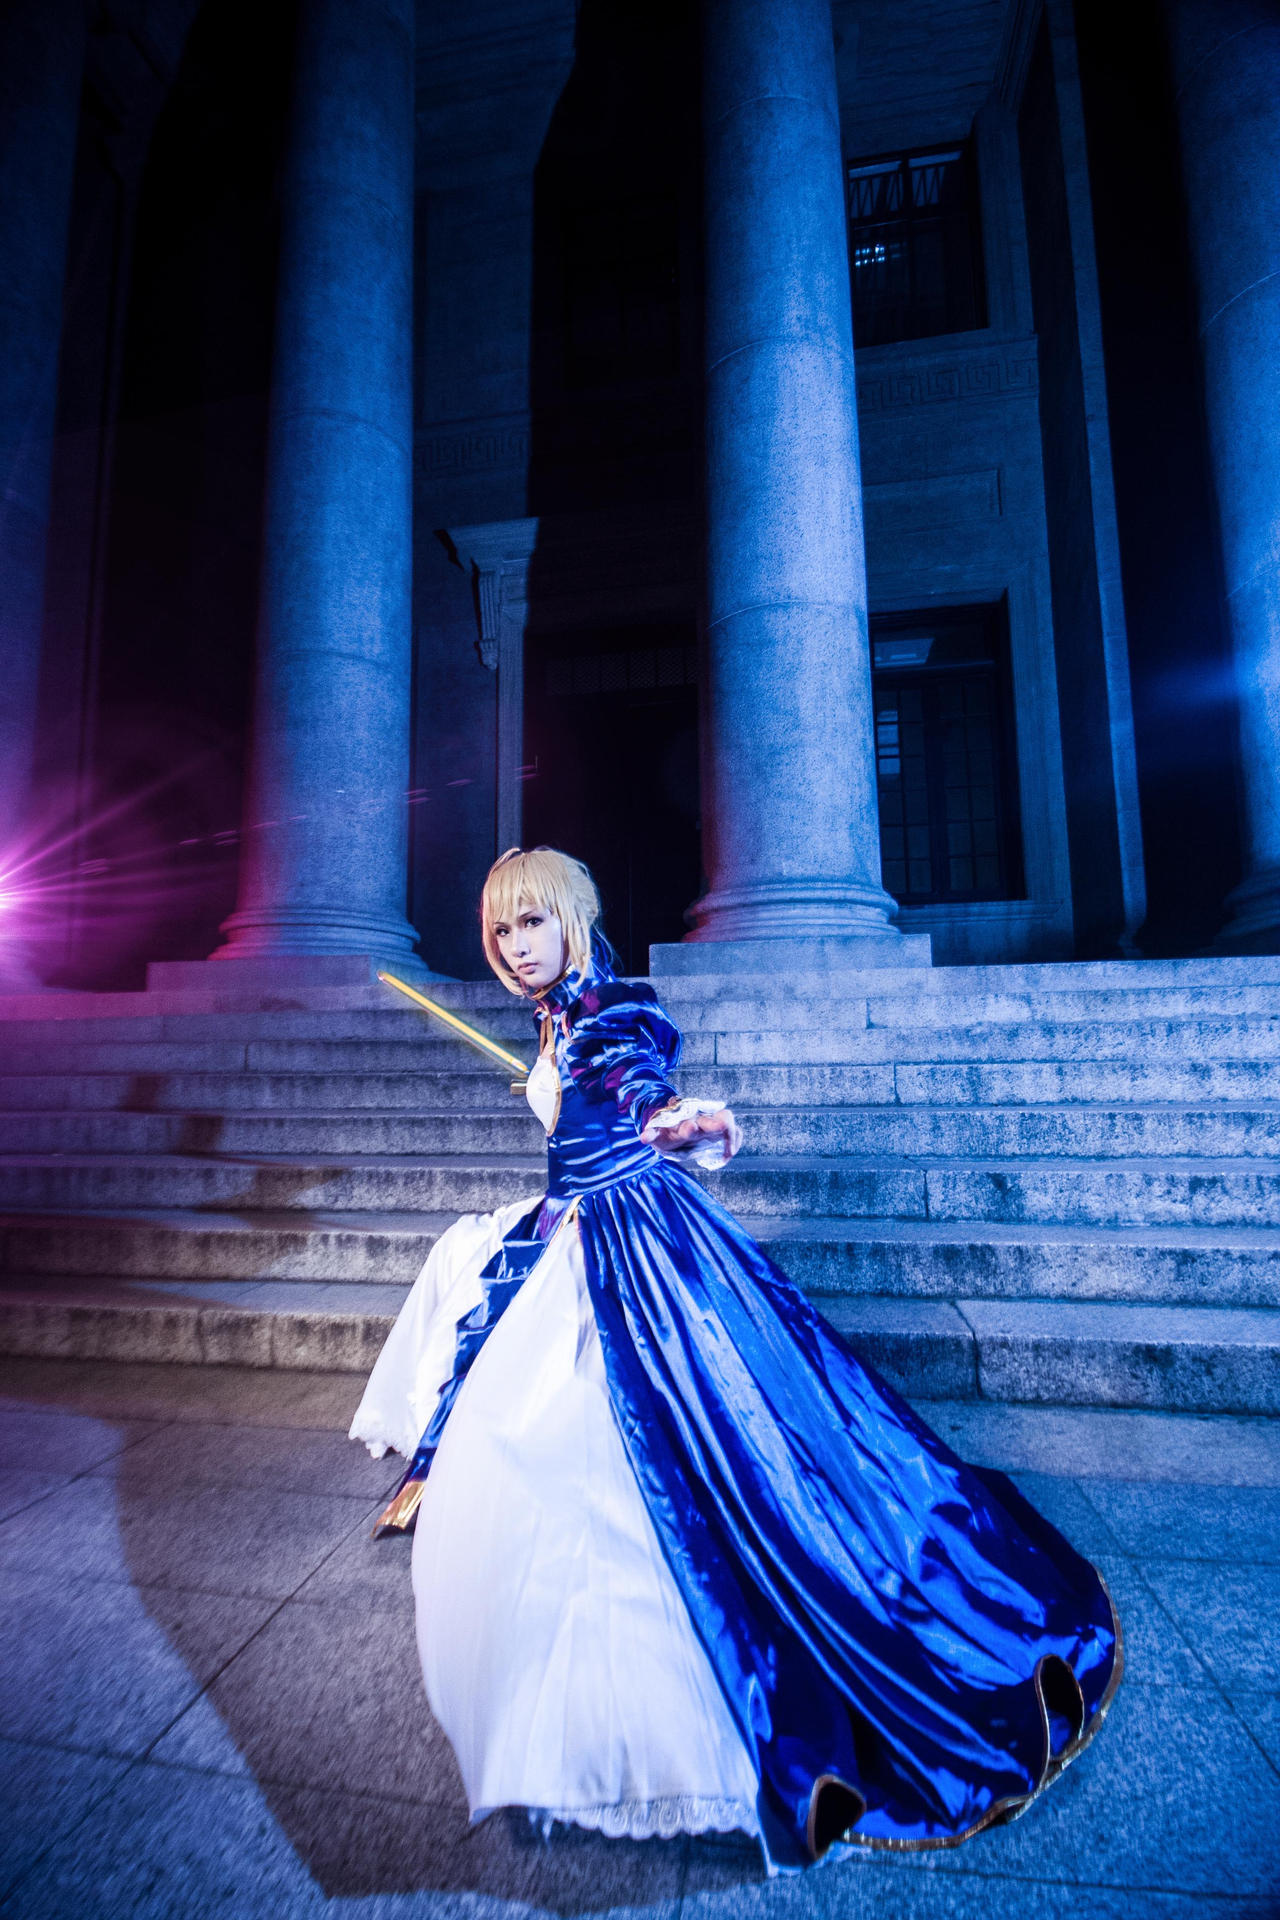 Fate Stay Night/Fate Zero Saber blue gown by DeutschGreen